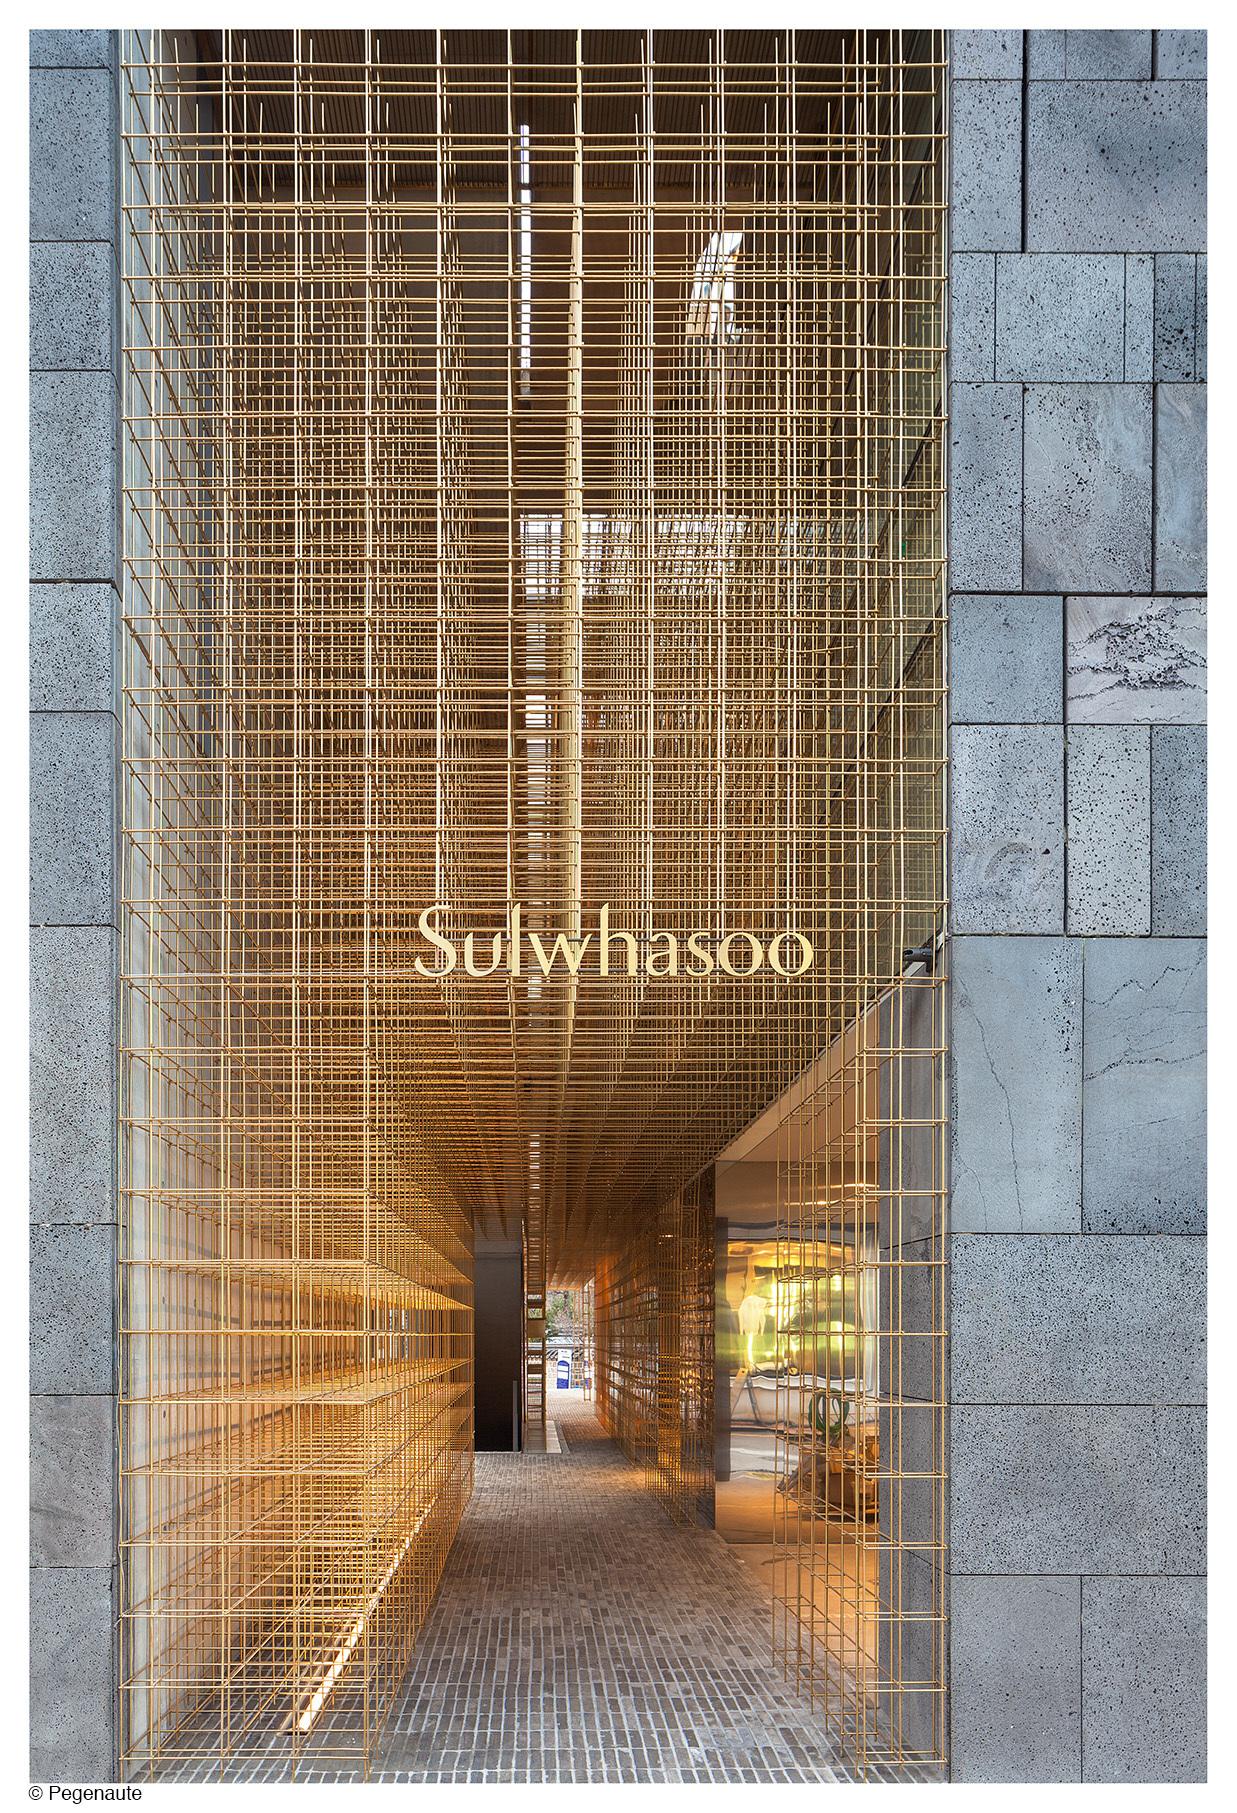 Amore Sulwhasoo Flagship Store Neri Amp Hu Design And